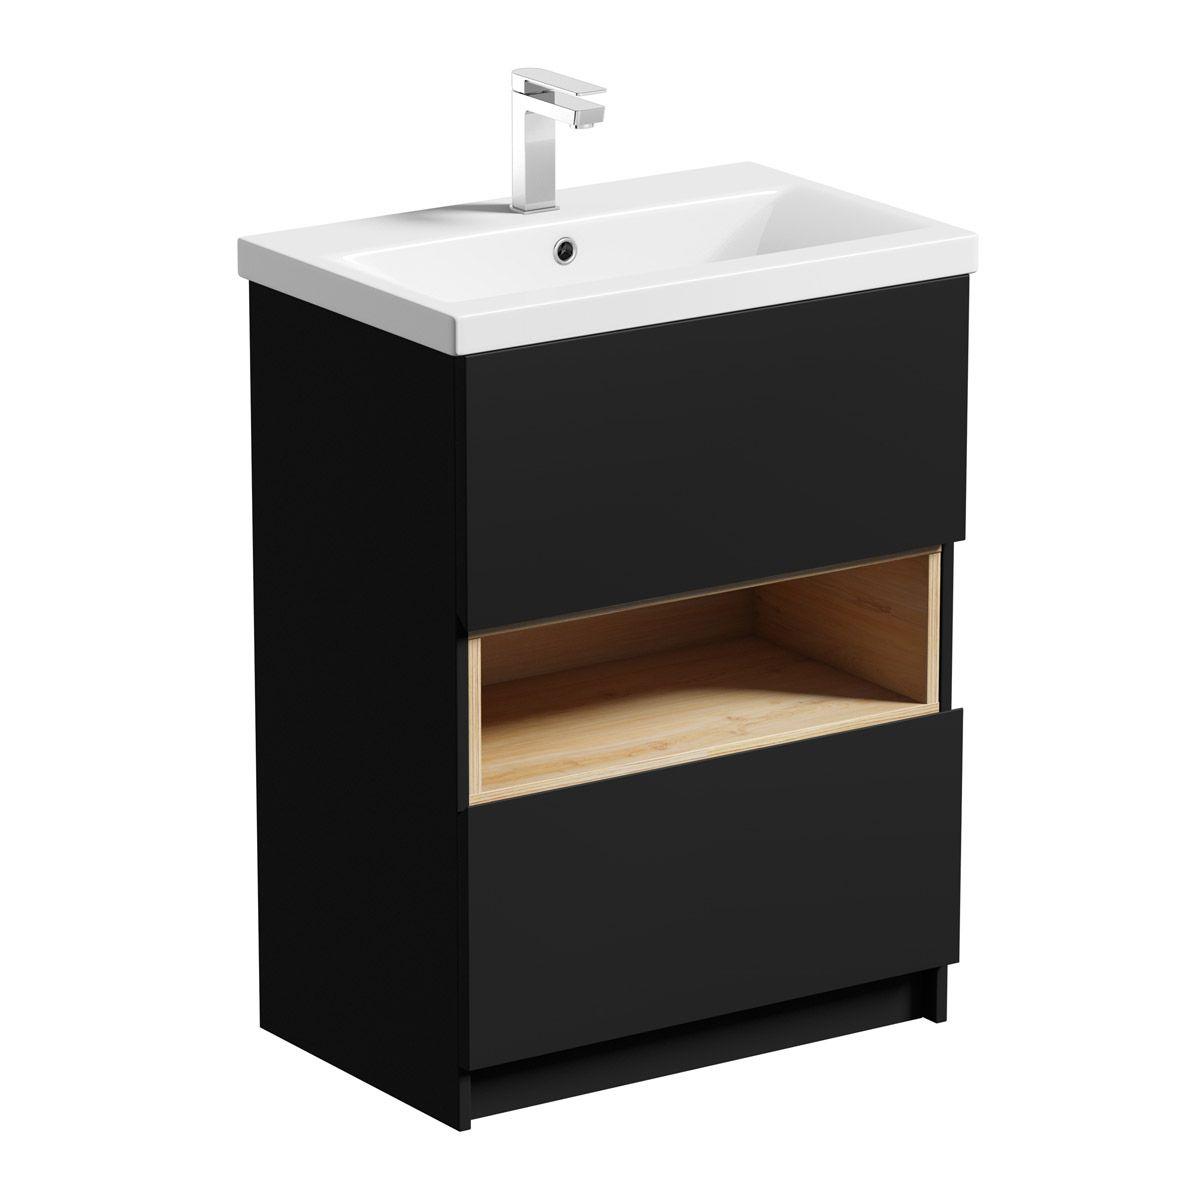 Mode Tate Anthracite Black Oak Floorstanding Vanity Unit And Ceramic Basin 600mm In 2020 Vanity Units Basin Vanity Unit Oak Vanity Unit